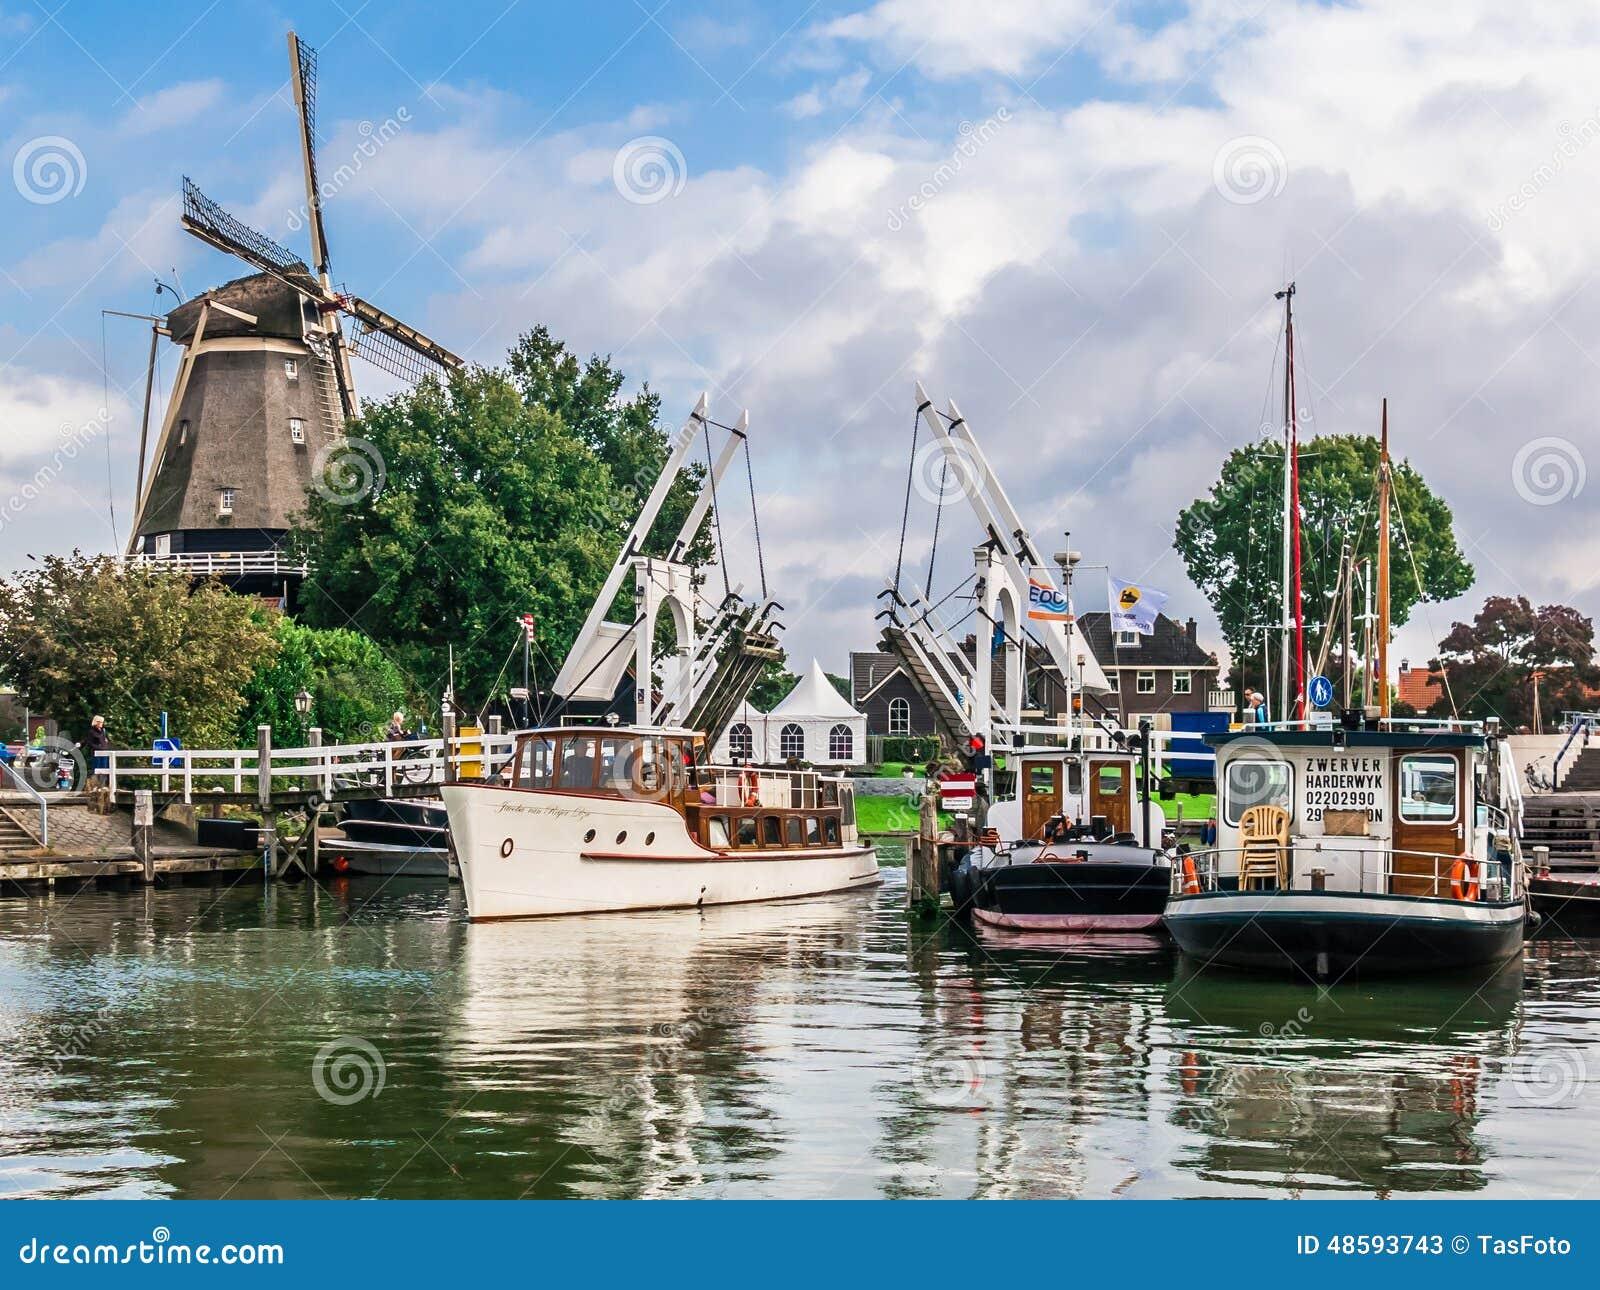 Harderwijk harbor and windmill, Holland